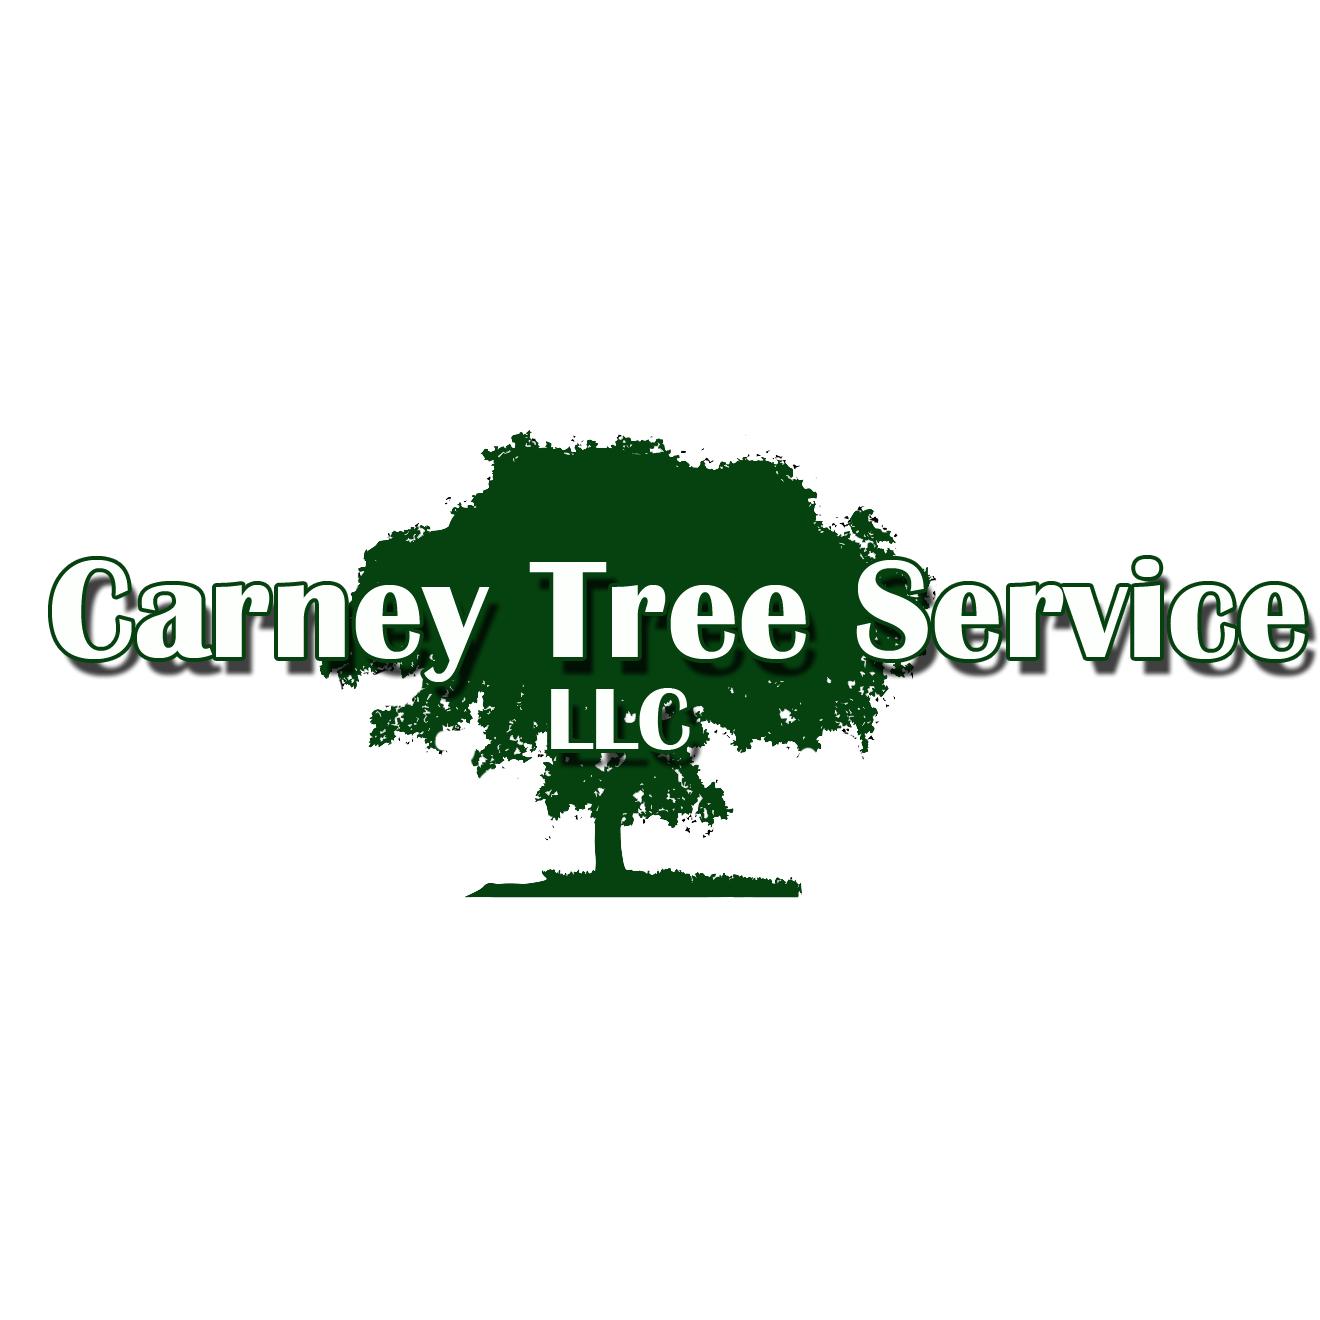 Carney Tree Service, LLC